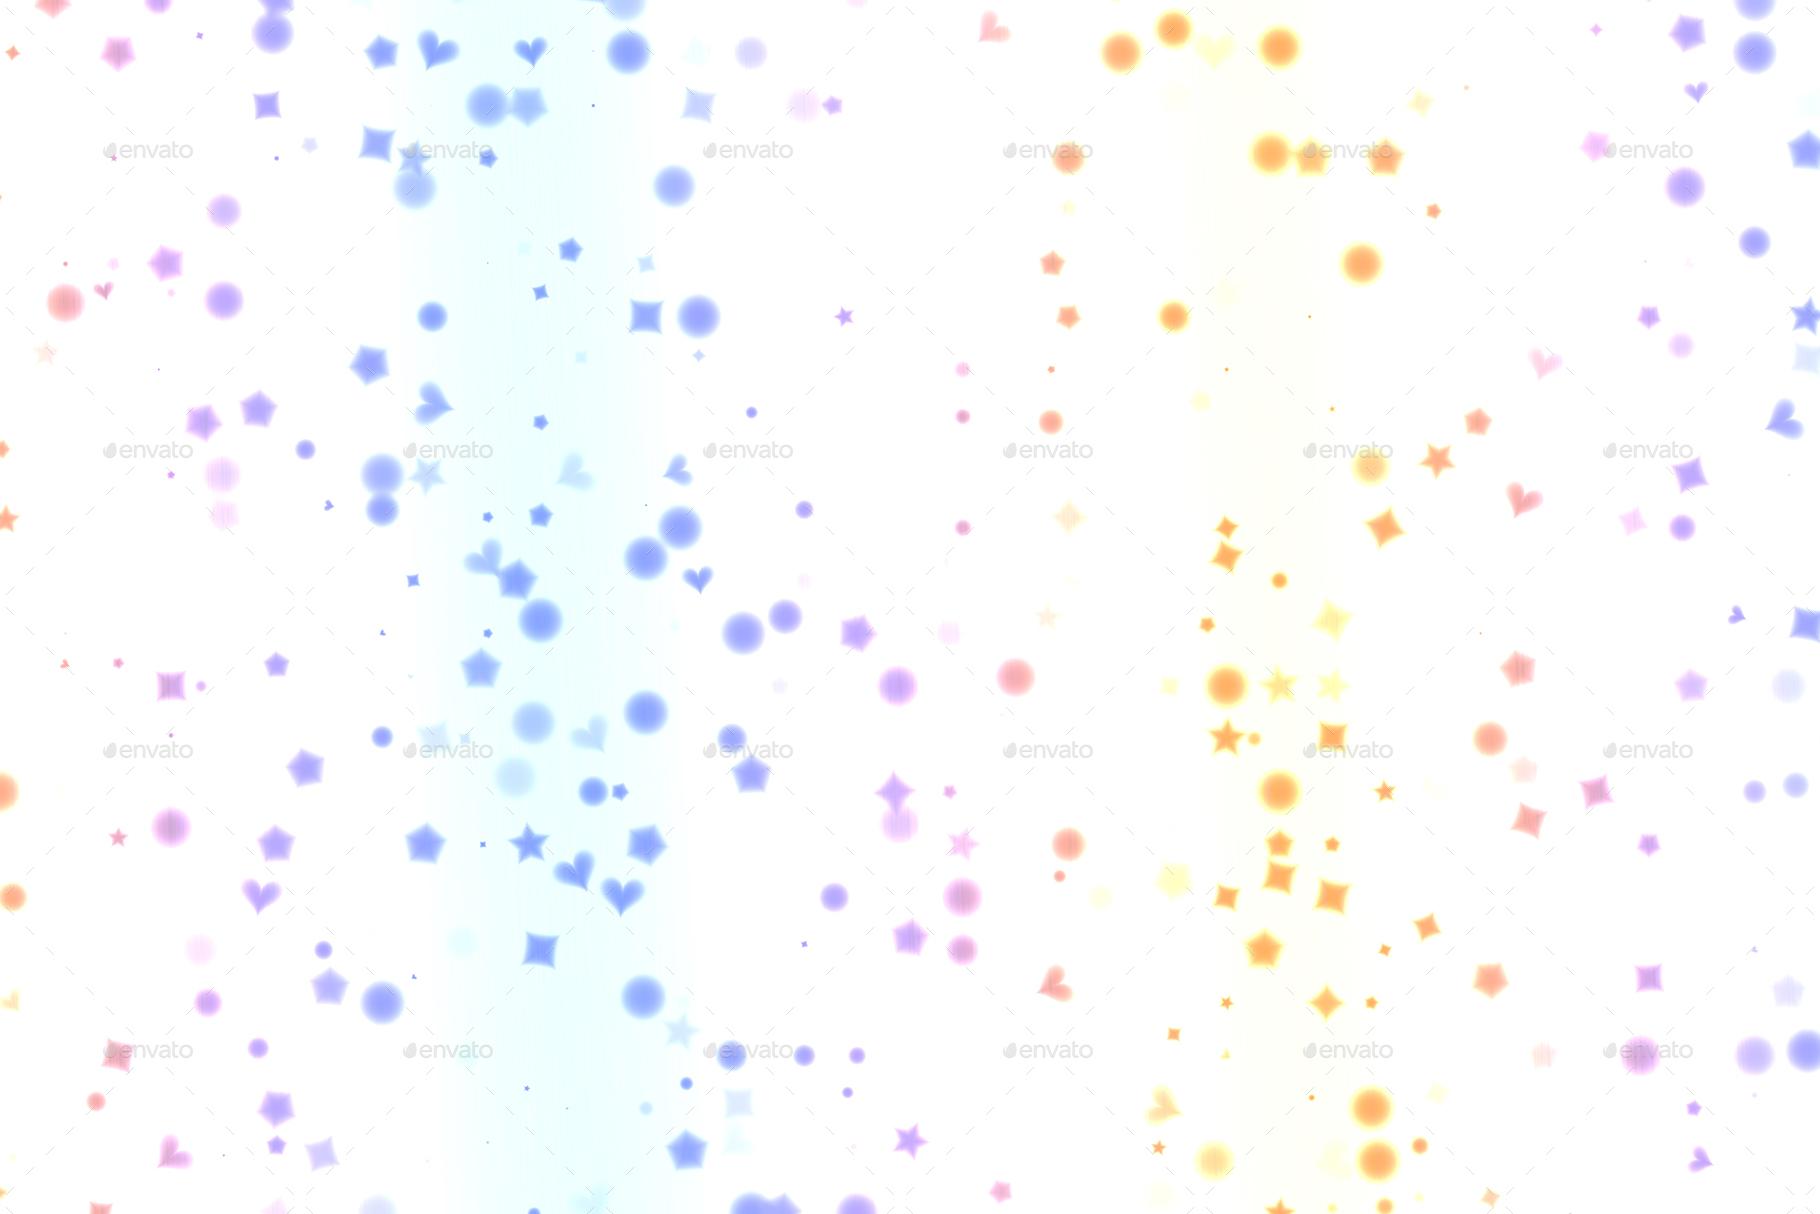 10 confetti glitter backgrounds by webcombo